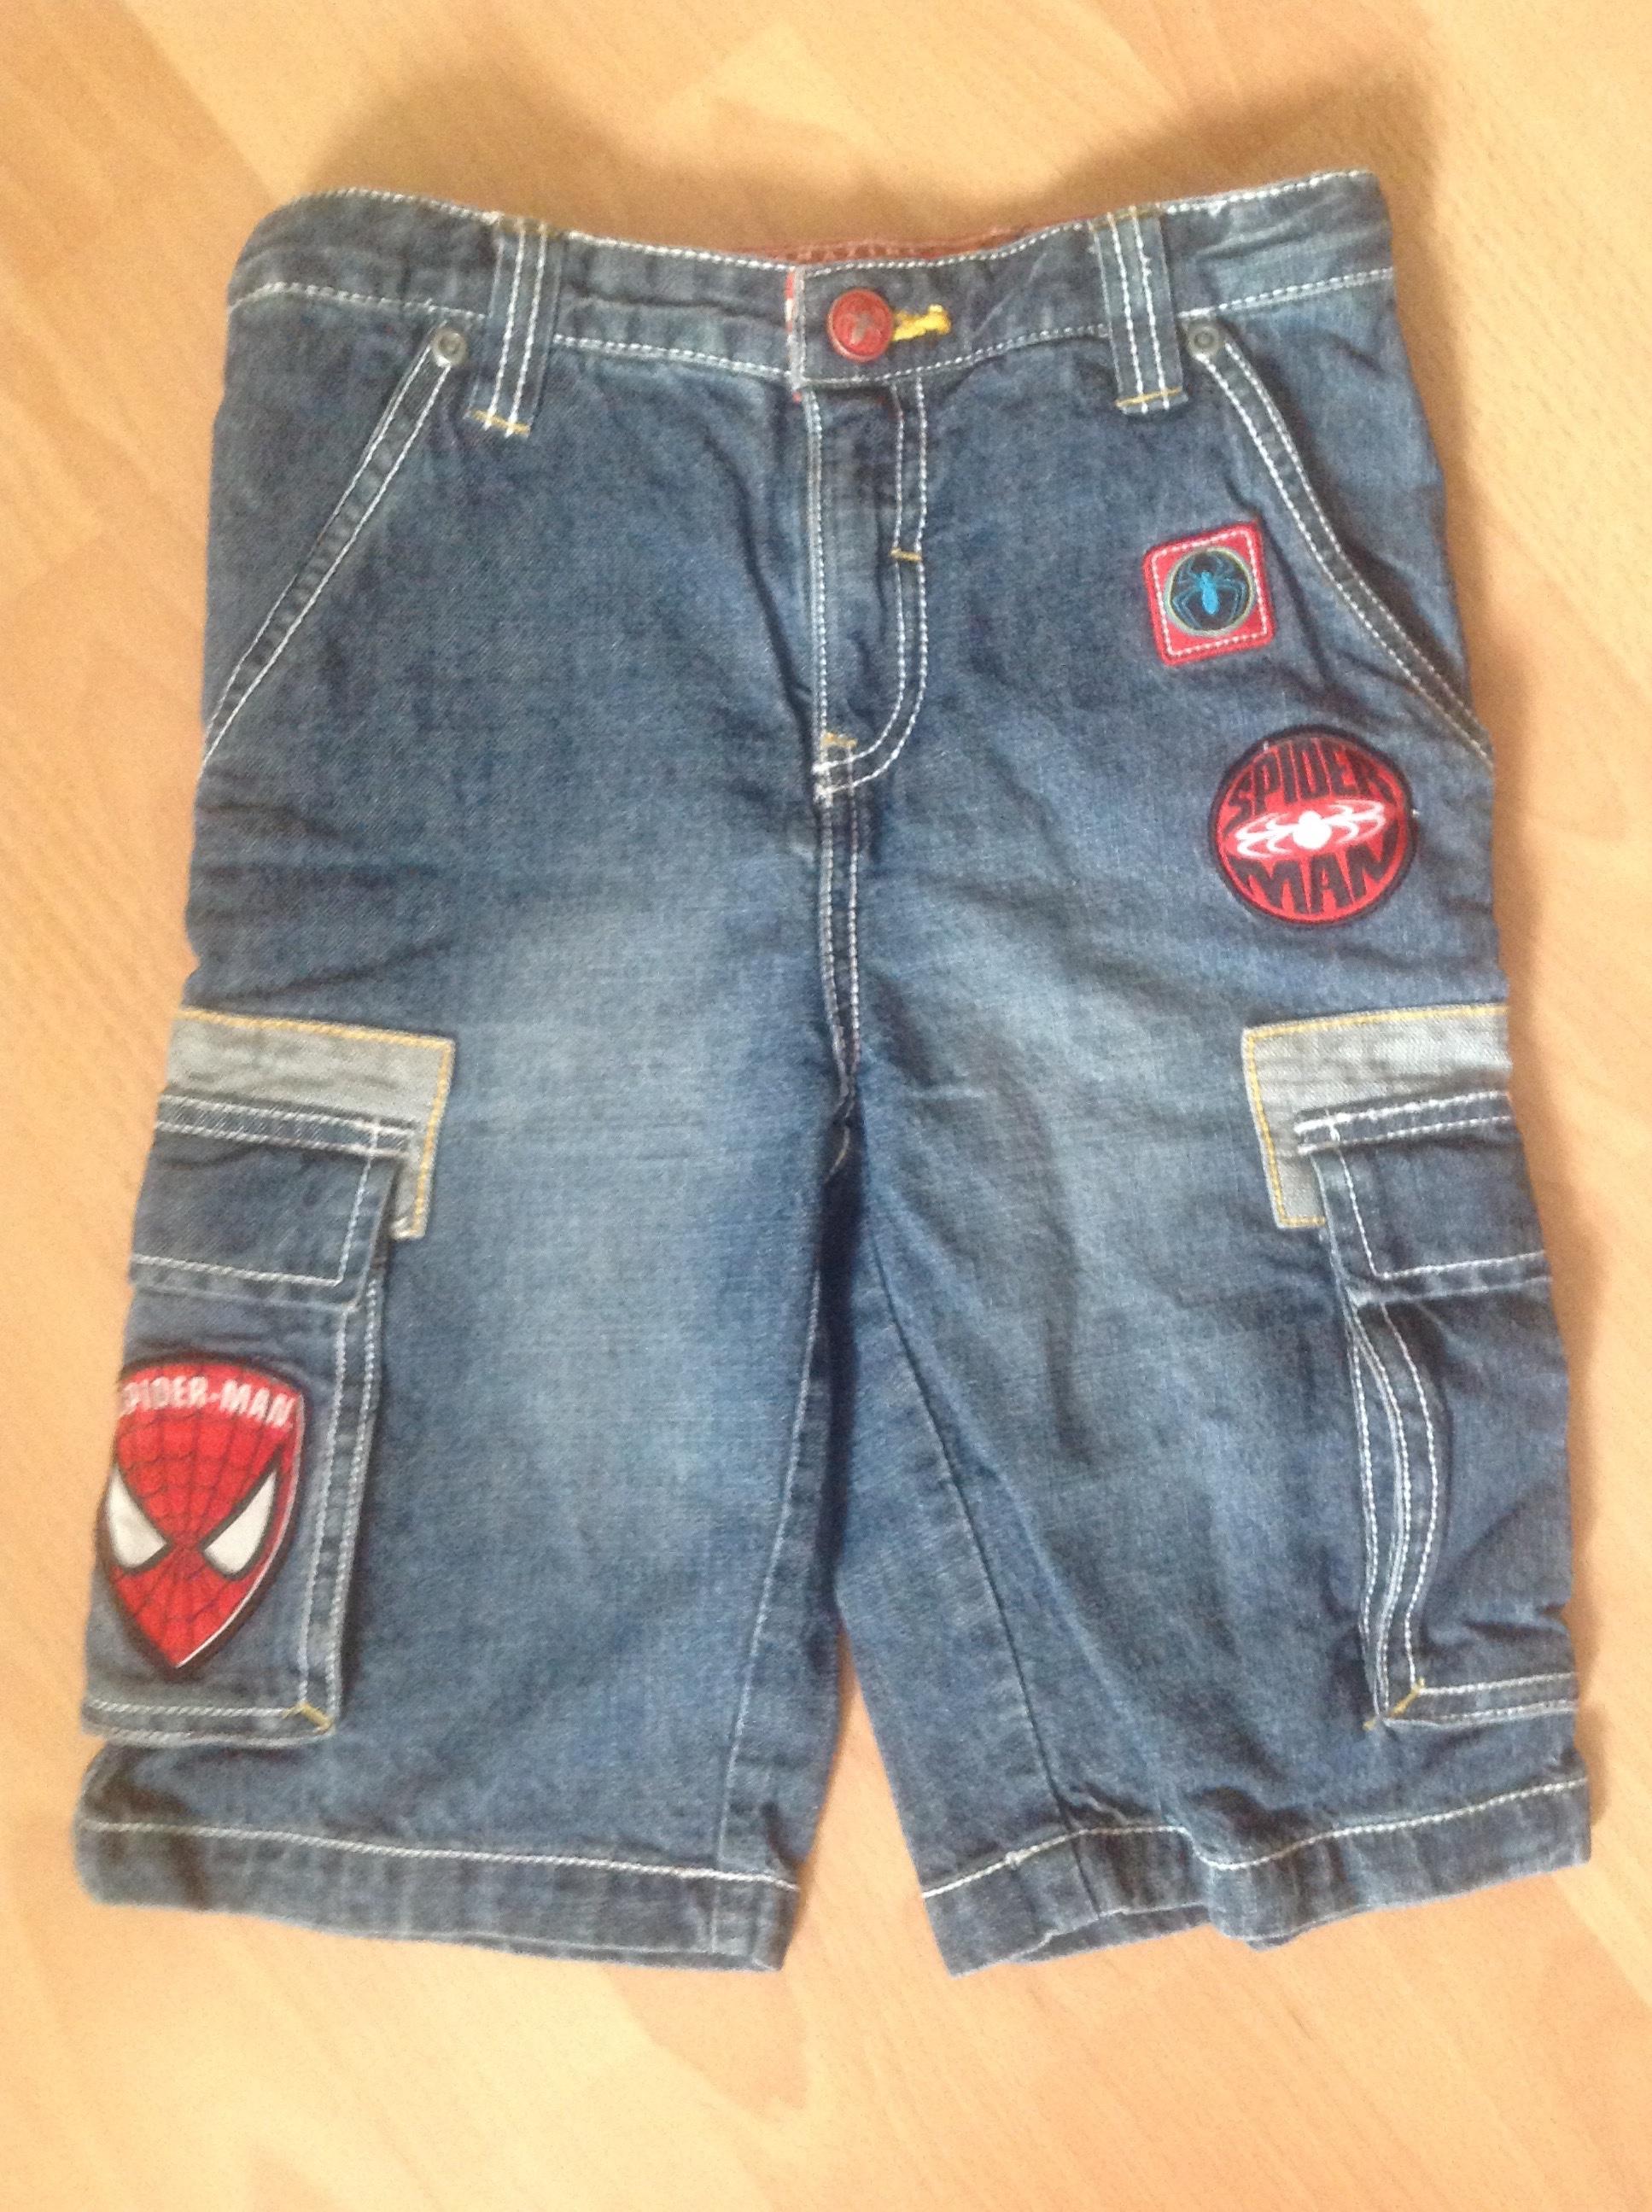 beau short en jean bleu SPIDERMAN T. 6 ans garçon TBE 2 Saint-Chinian (34)